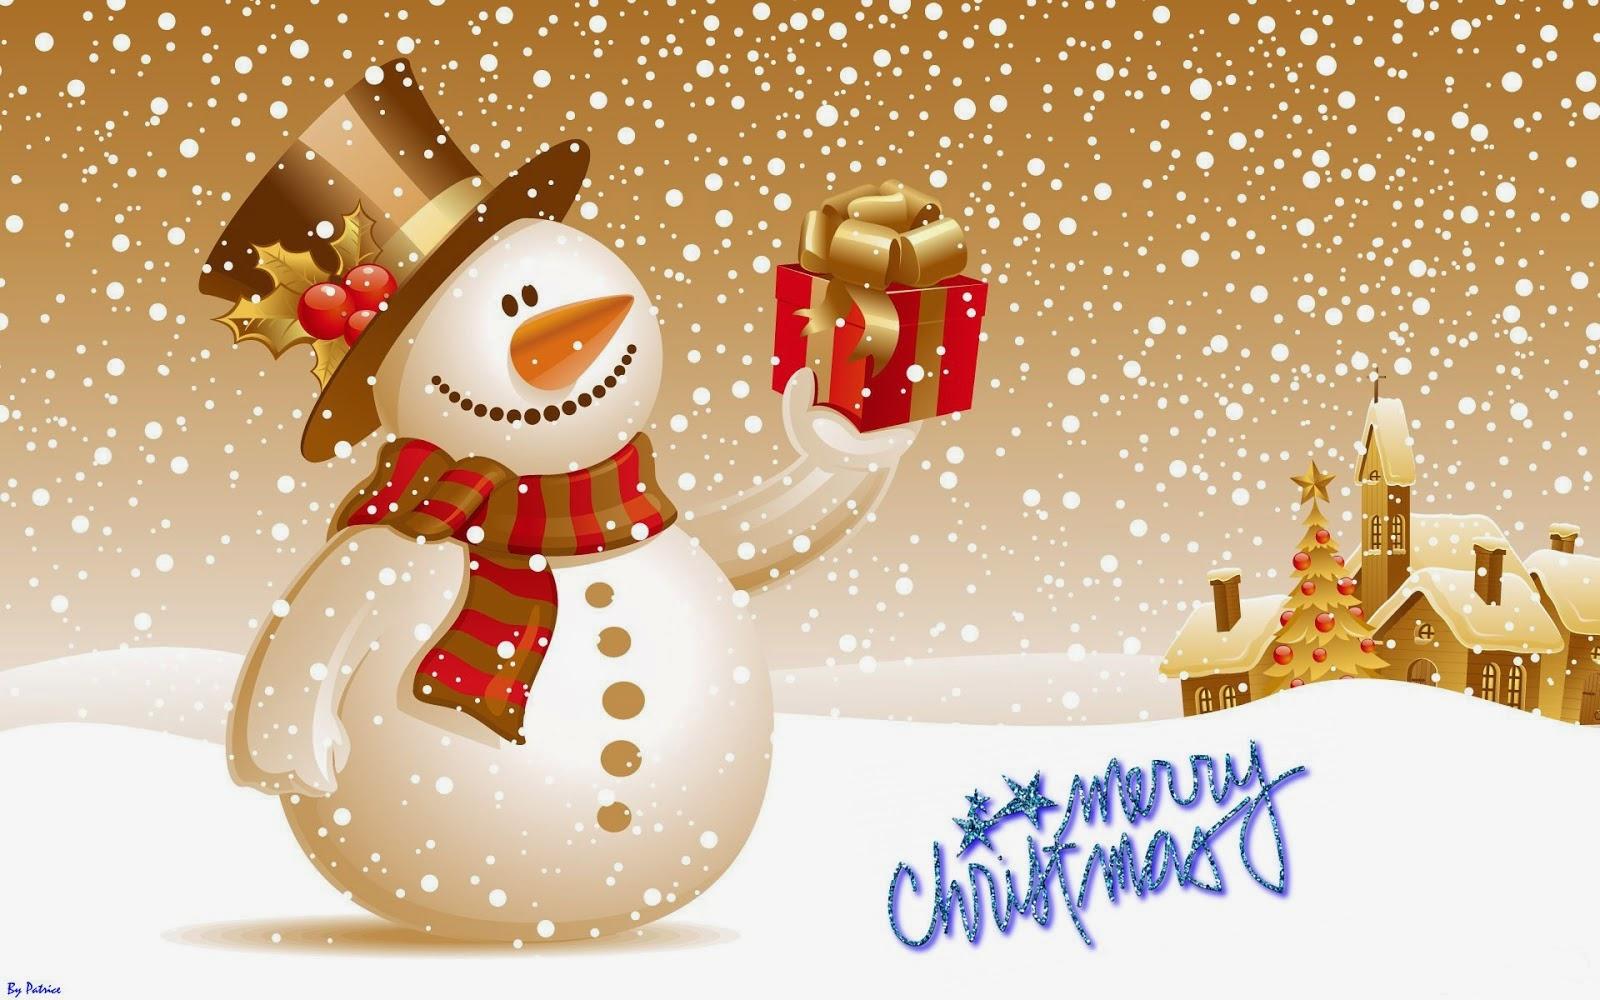 go dutch !: christmas day 2014